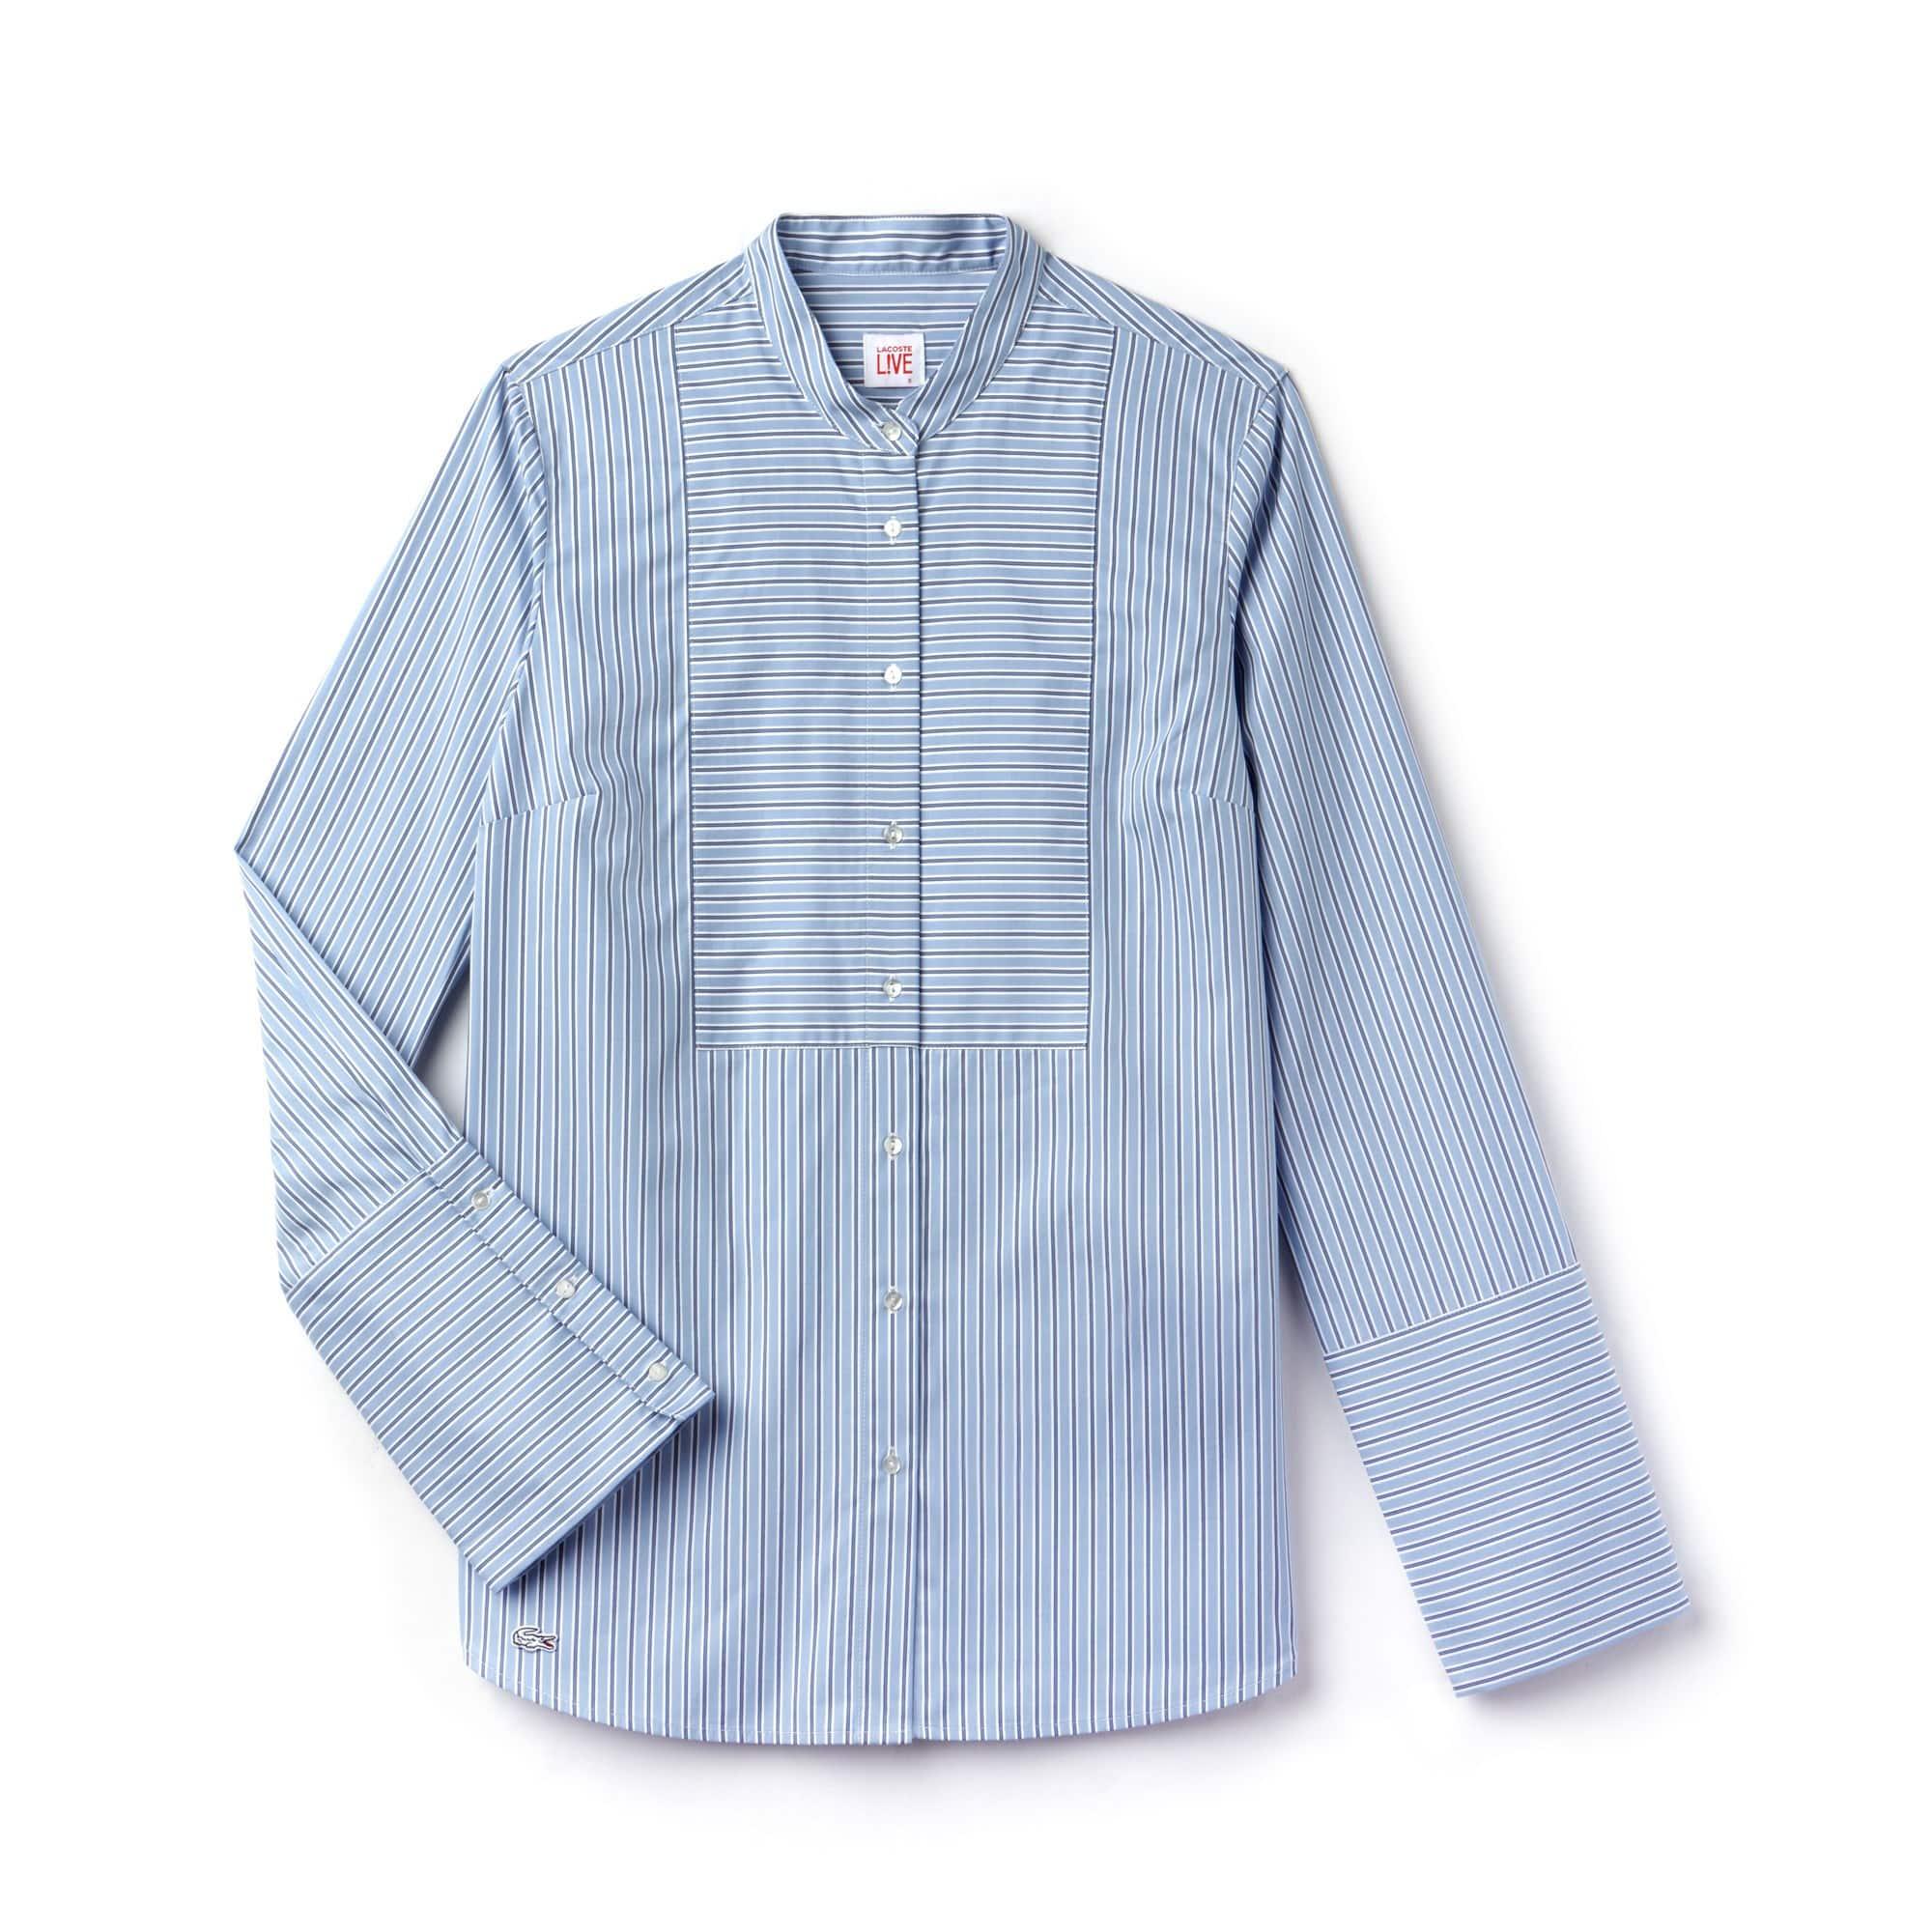 Camisa loose fit Lacoste LIVE de popelín de rayas